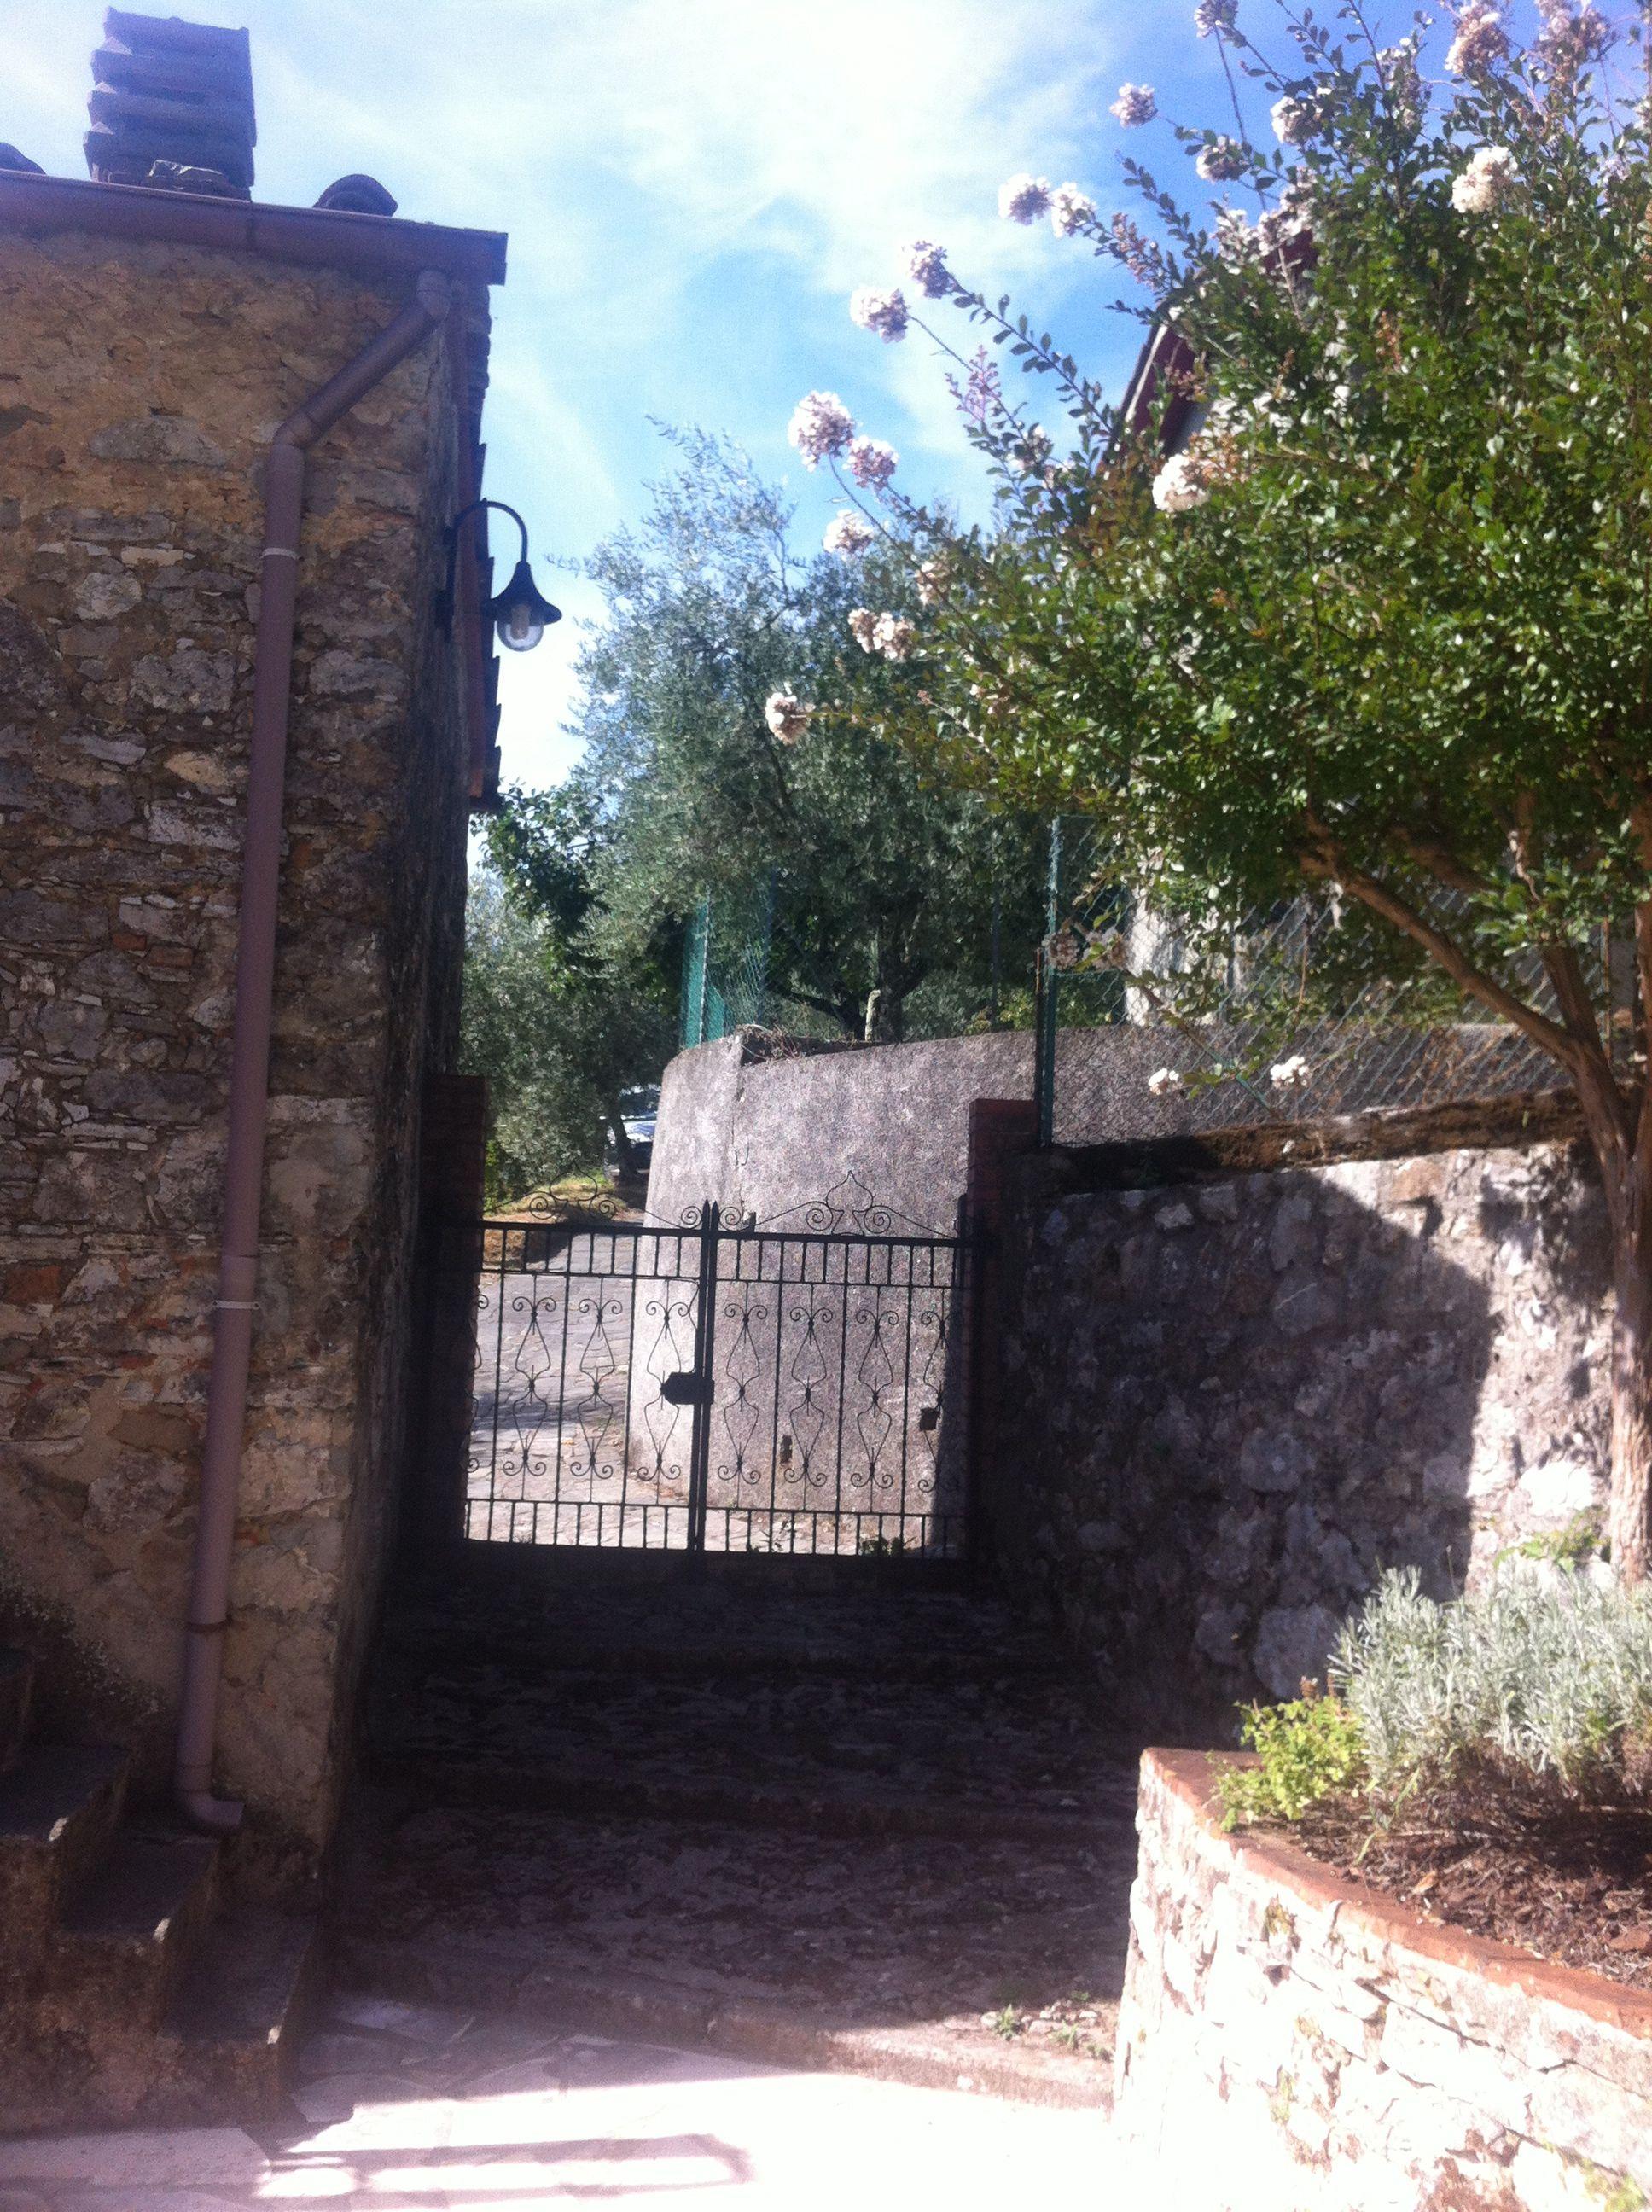 #entry #Casa dei Sogni #Tuscany